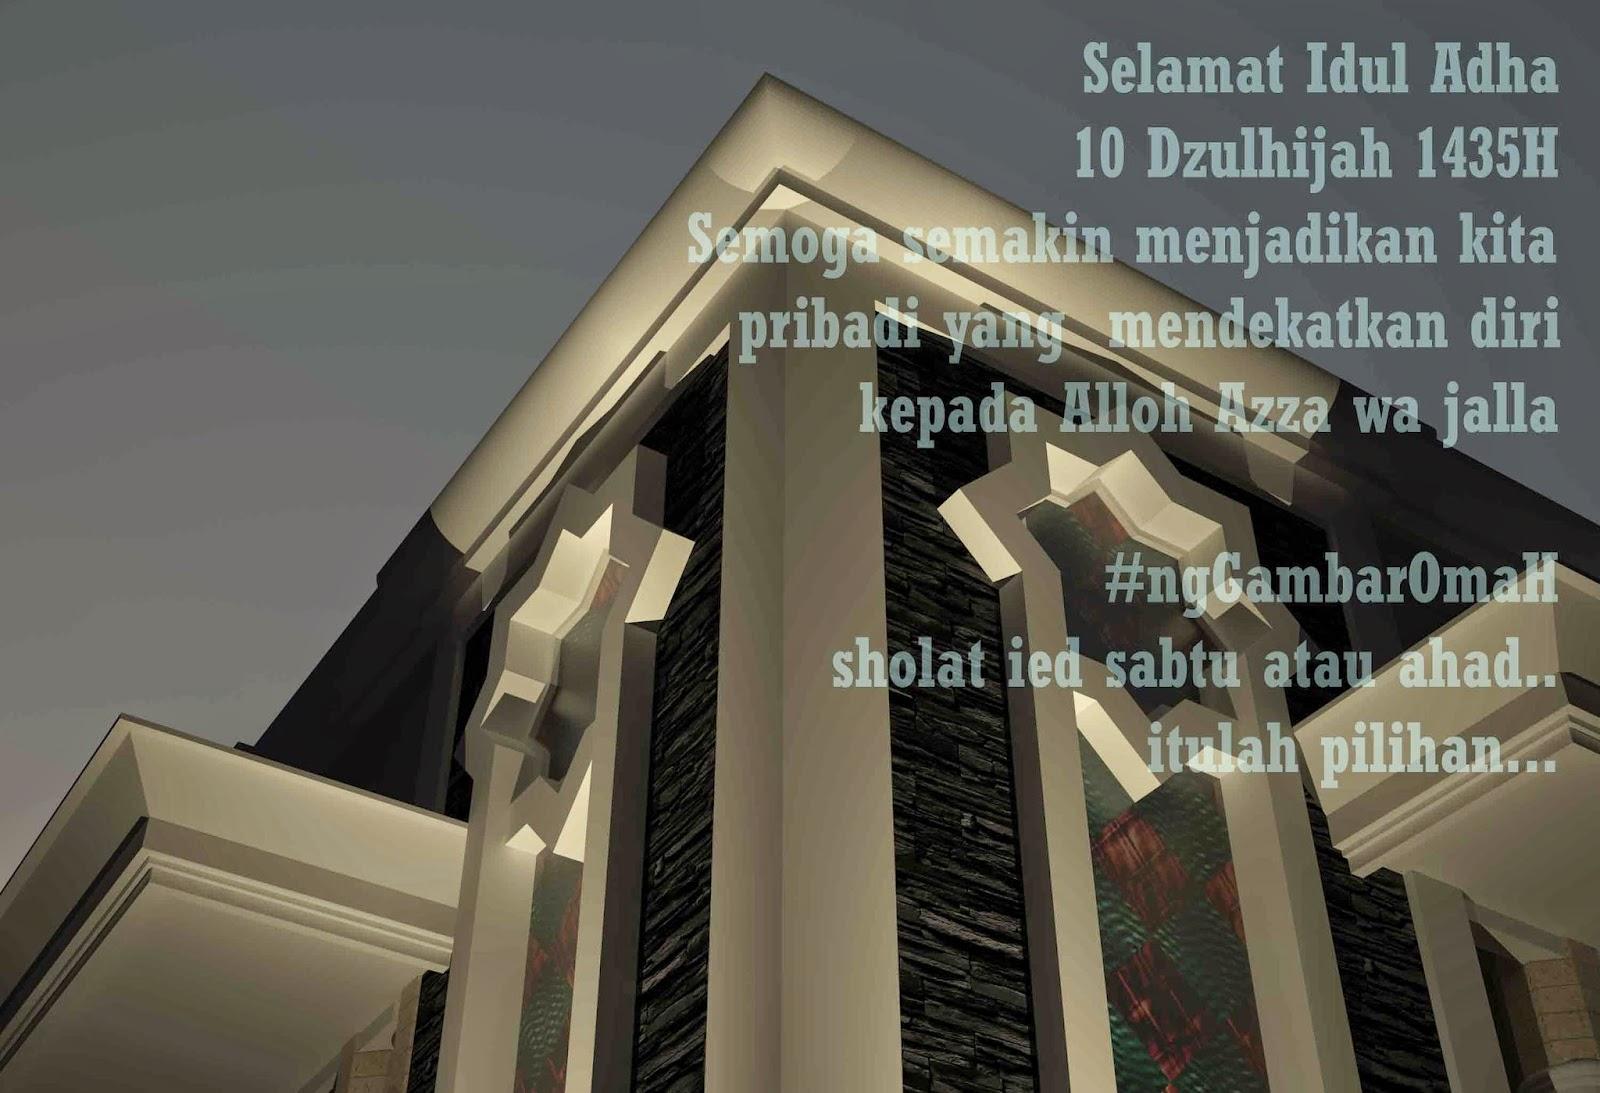 Selamat Idul Adha 10 Dzulhijah 1435 H...